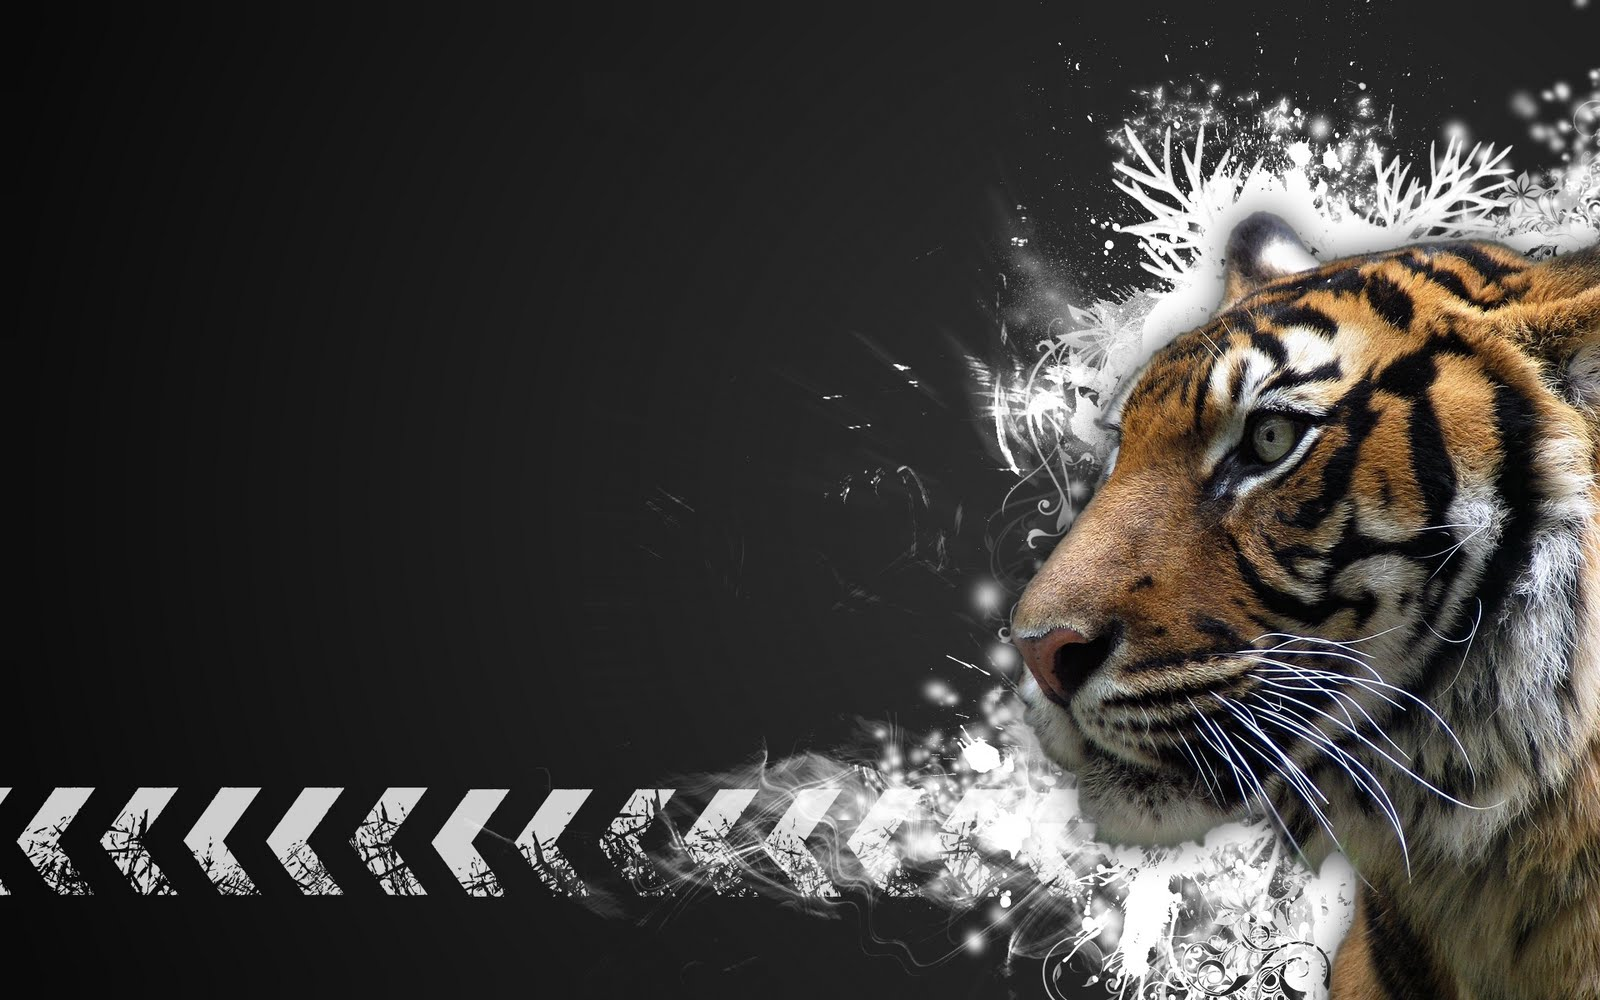 tiger wallpapers hd Tiger Vector Widescreen HD Wallpaperjpg 1600x1000